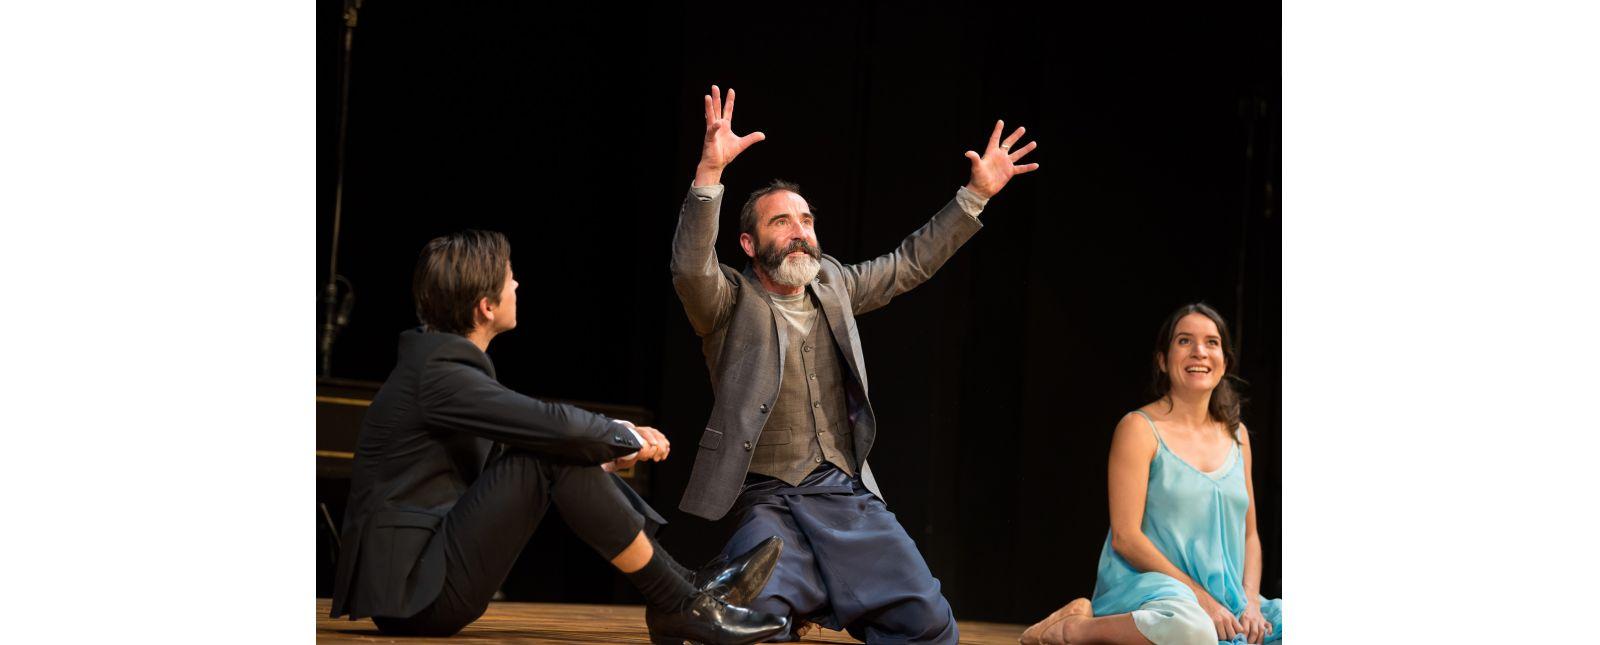 Das Nibelungenlied // Lukas Hupfeld // Henry Meyer // Laura Angelina Palacios //  2018 //  Foto: Marc Doradzillo